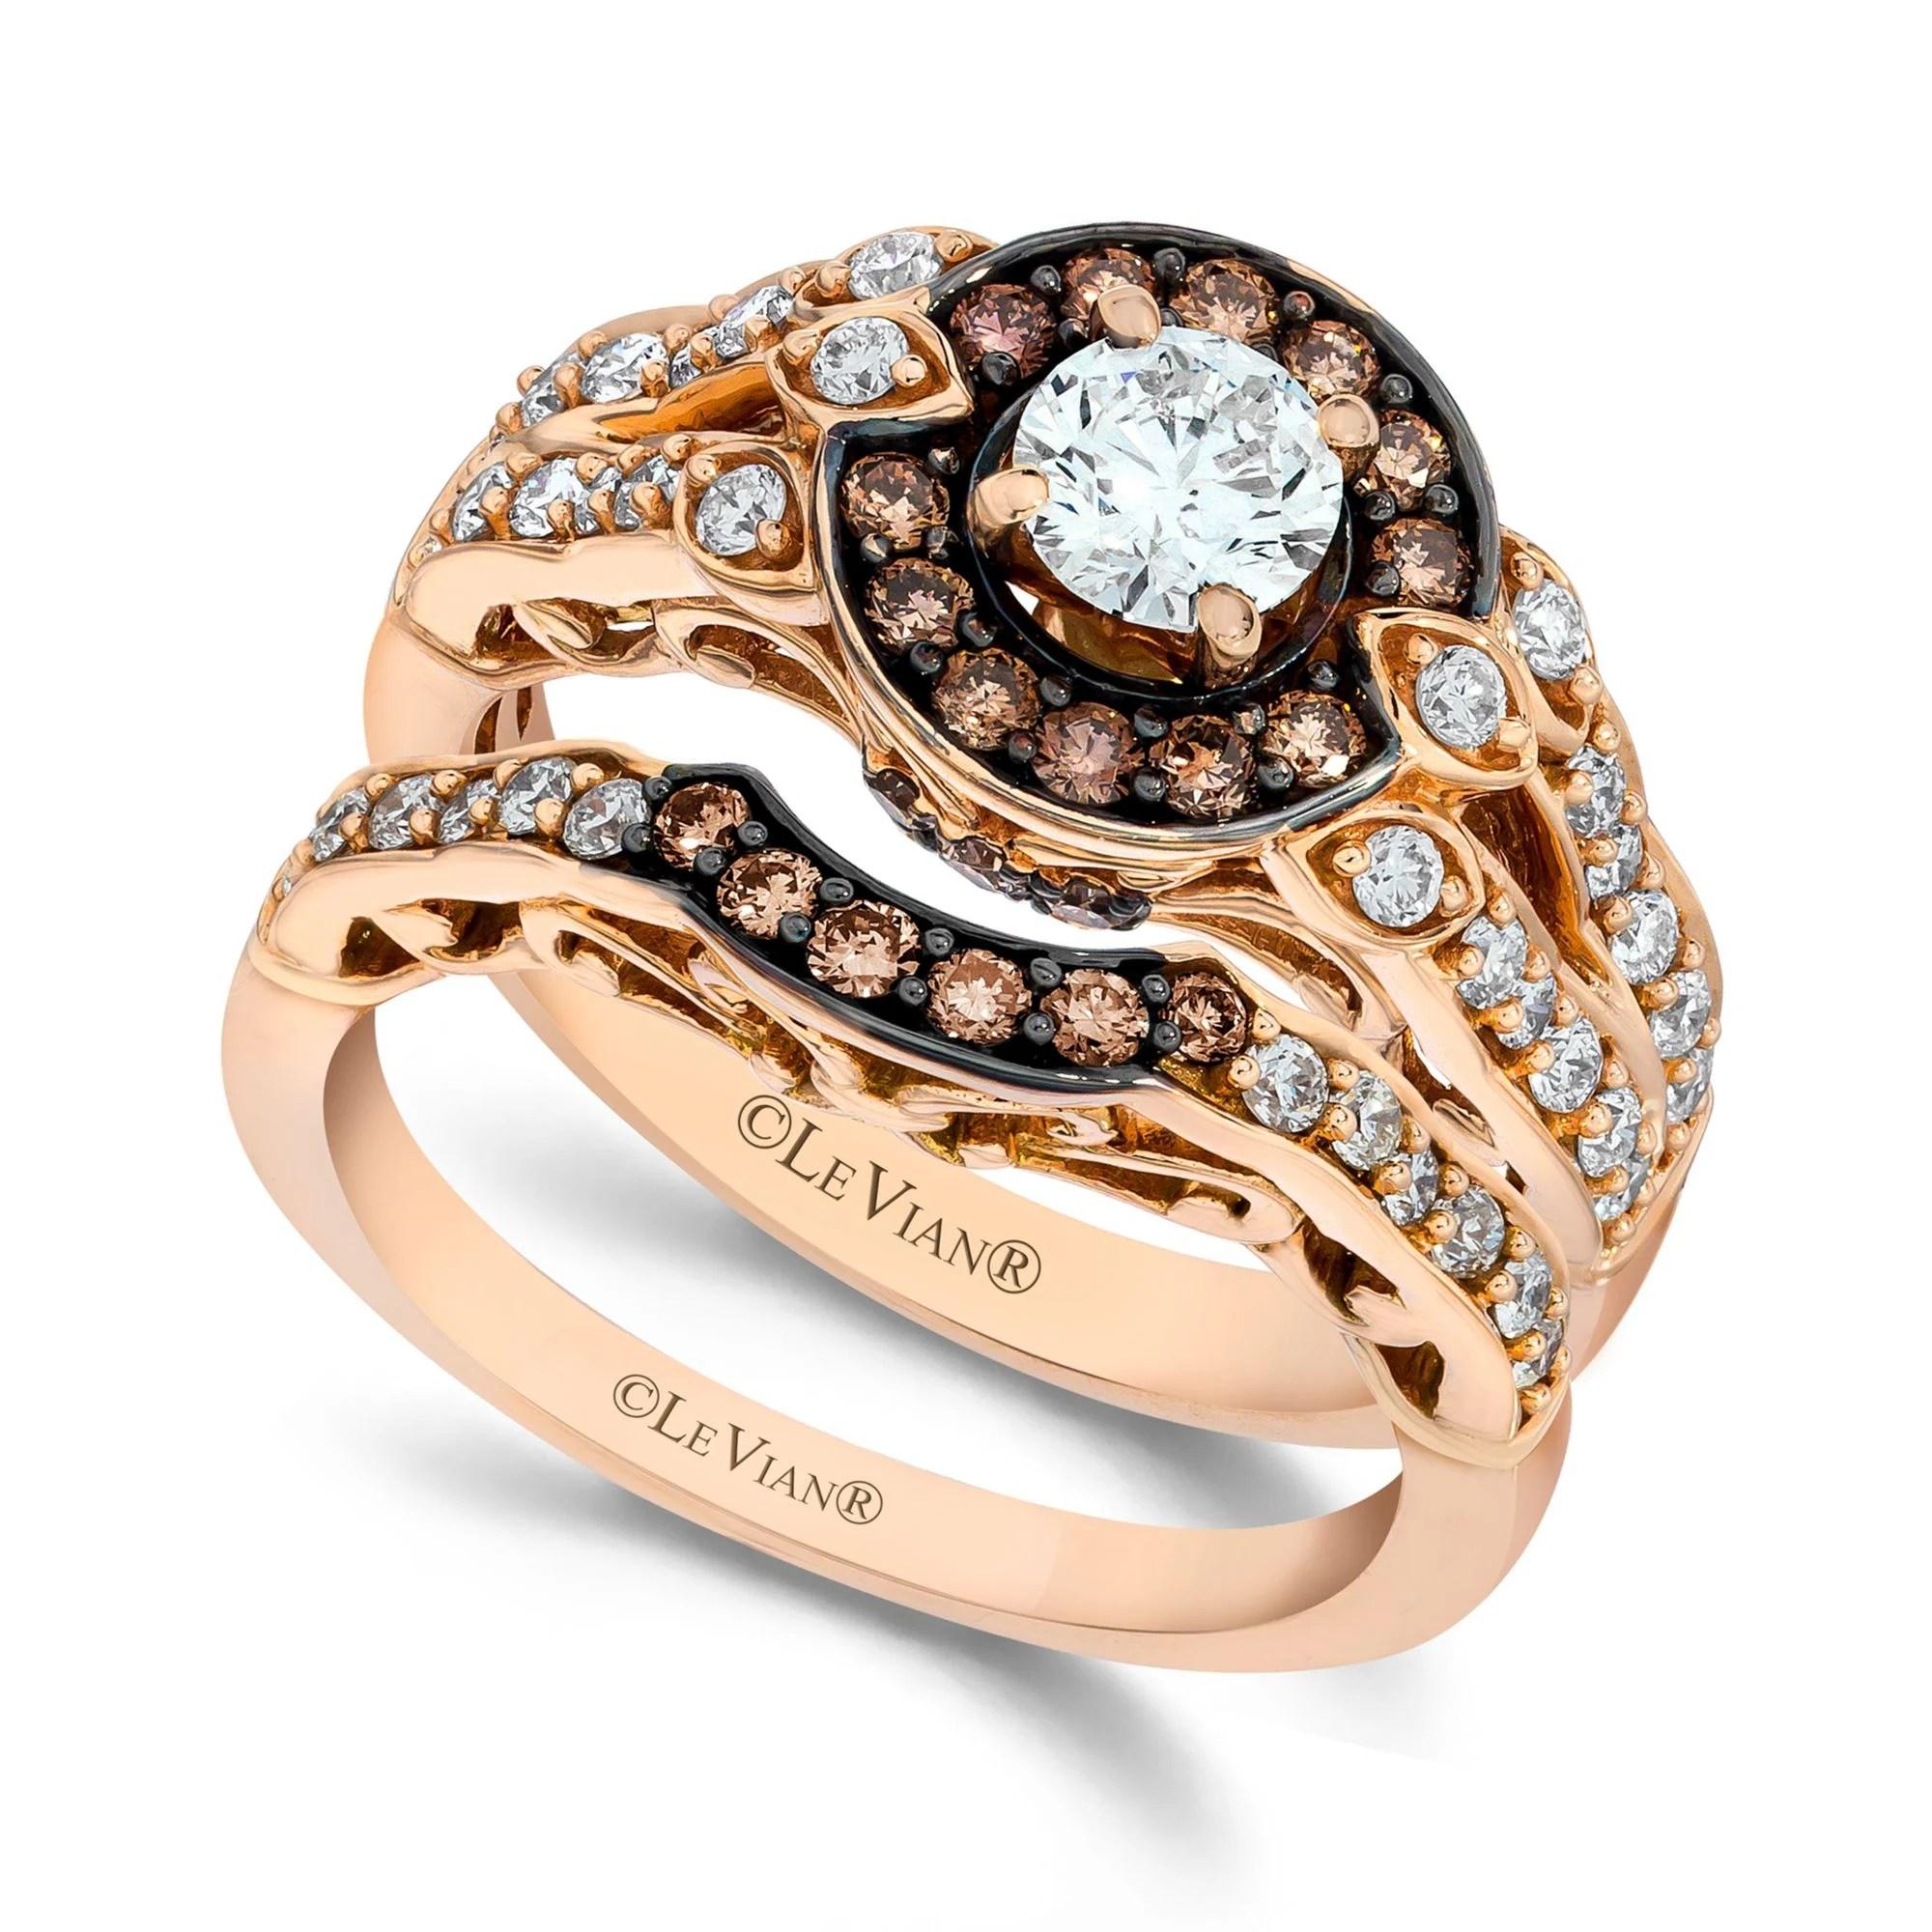 le vian le vian wedding bands Le Vian Jewelry at Atlanta West Jewelry